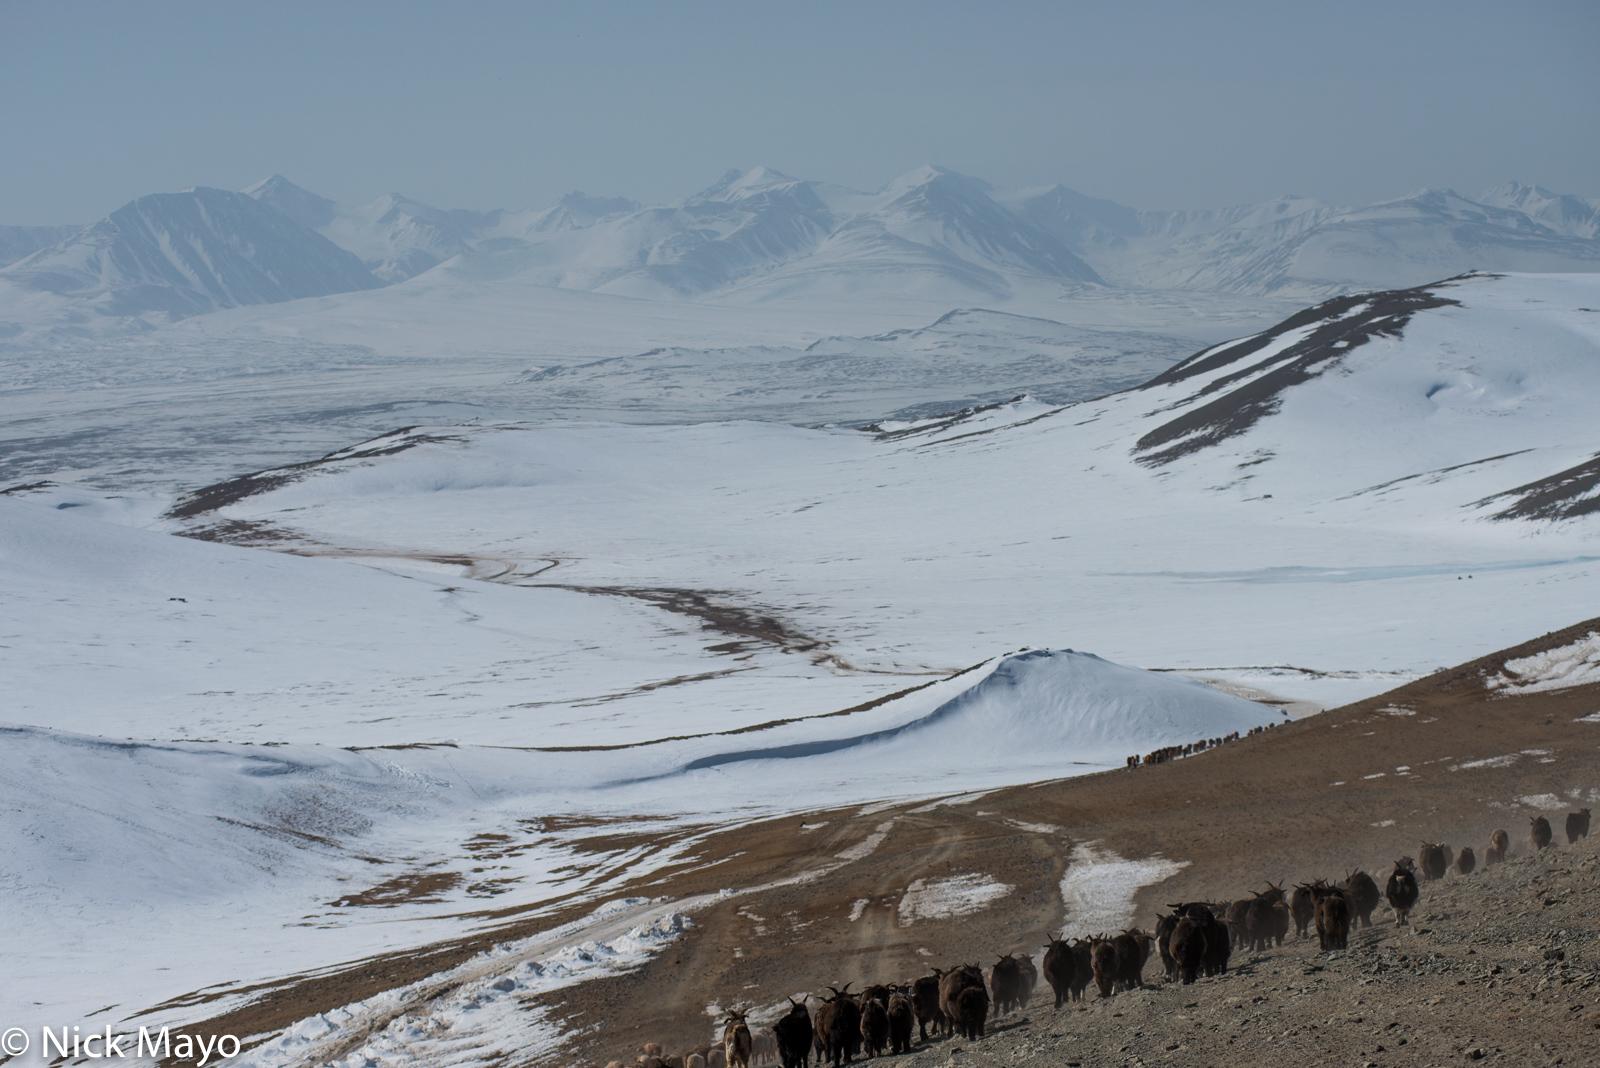 Bayan-Ölgii, Goat, Mongolia, photo